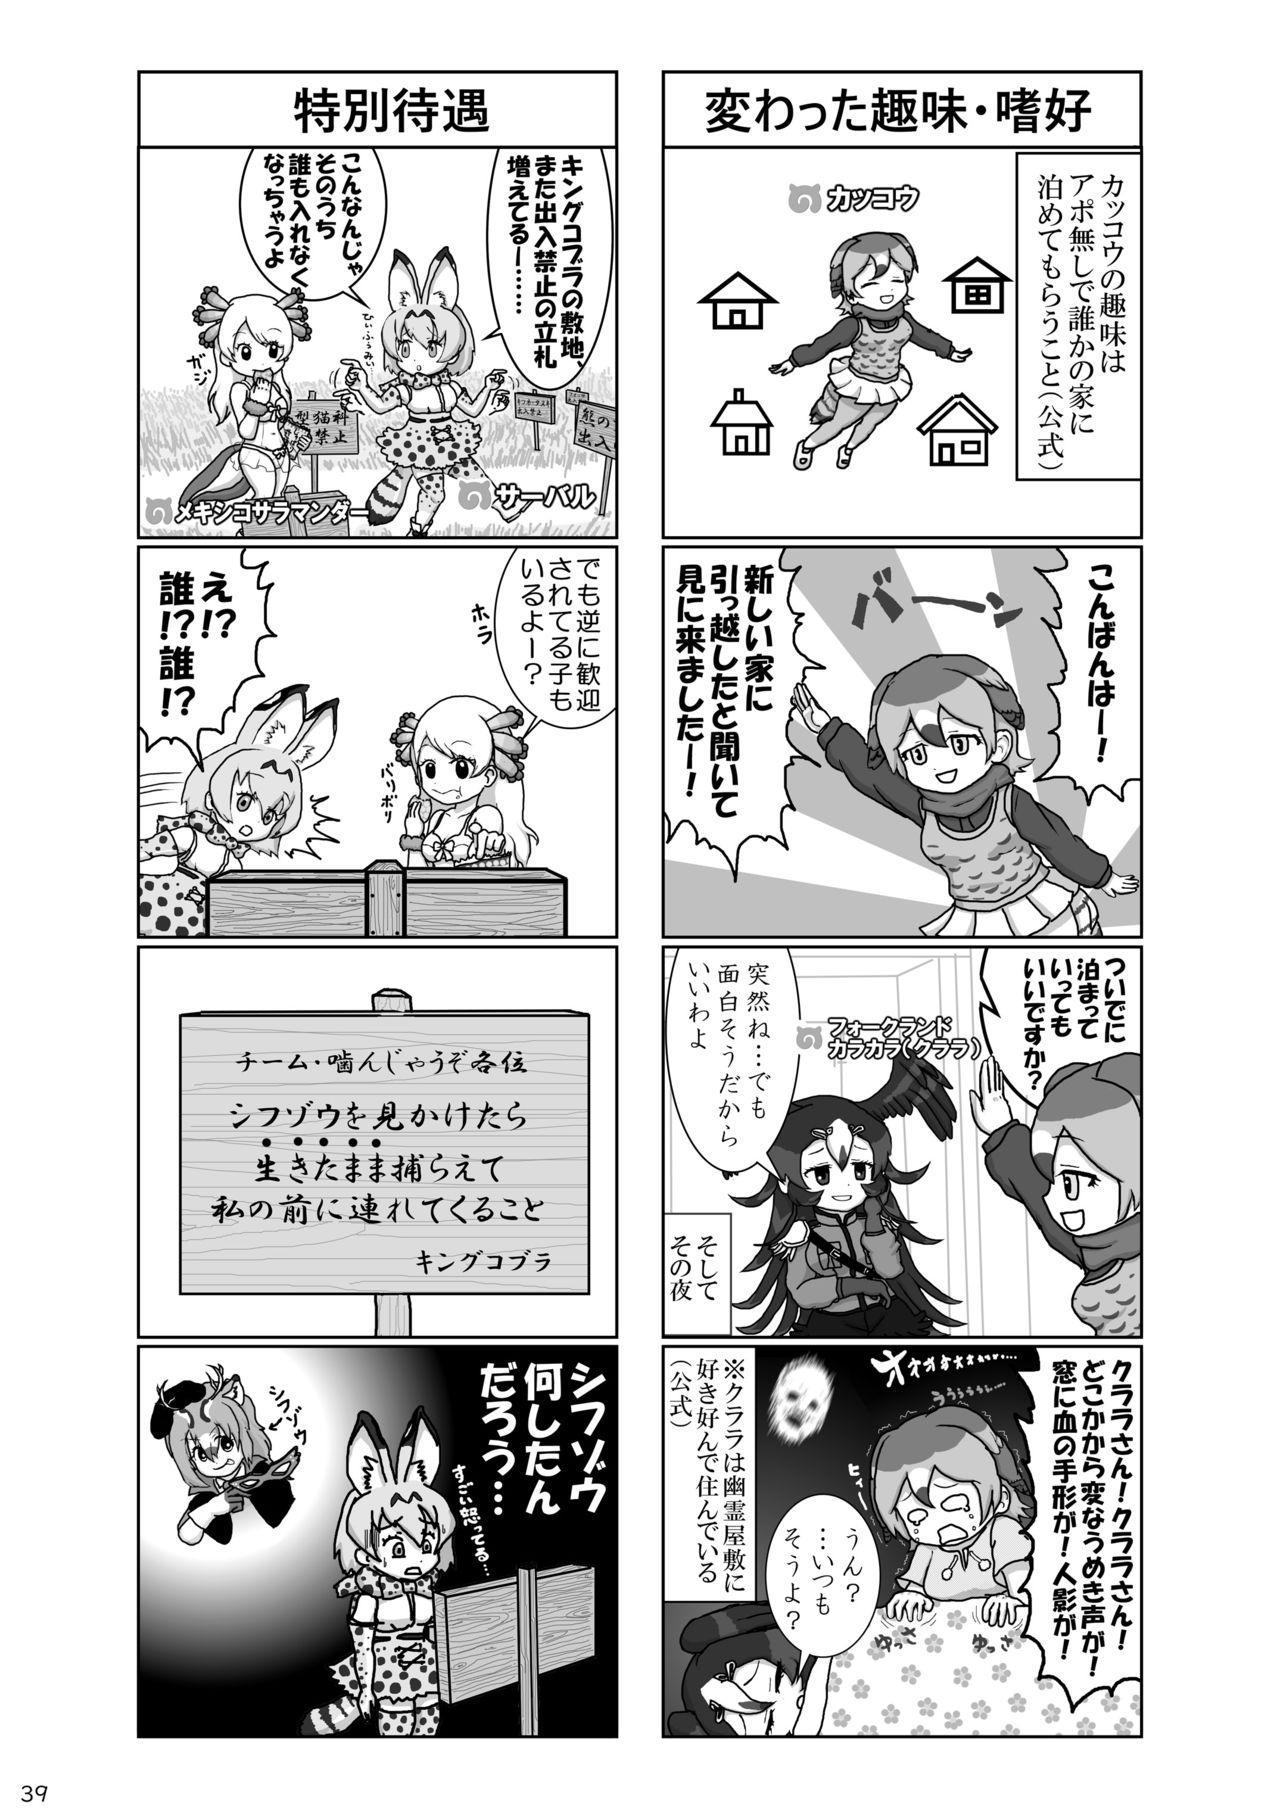 may Kemono Friends Thre Goudoushi 2 40